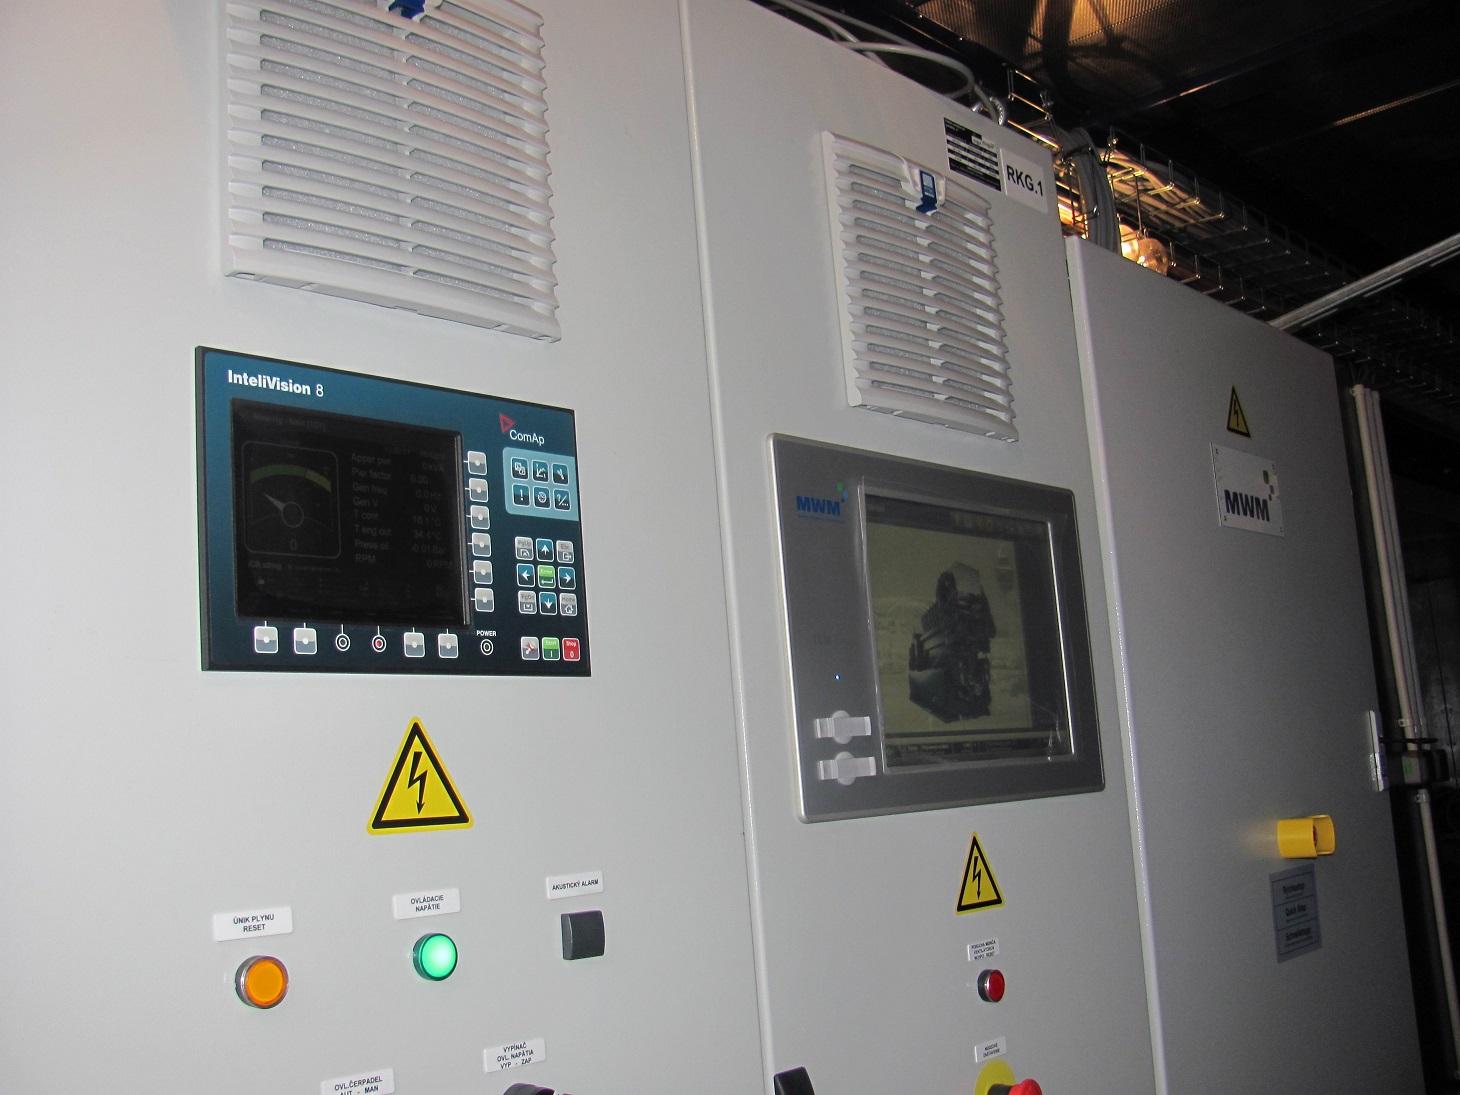 CHP_photo engul 1500 GACI_06 control panel